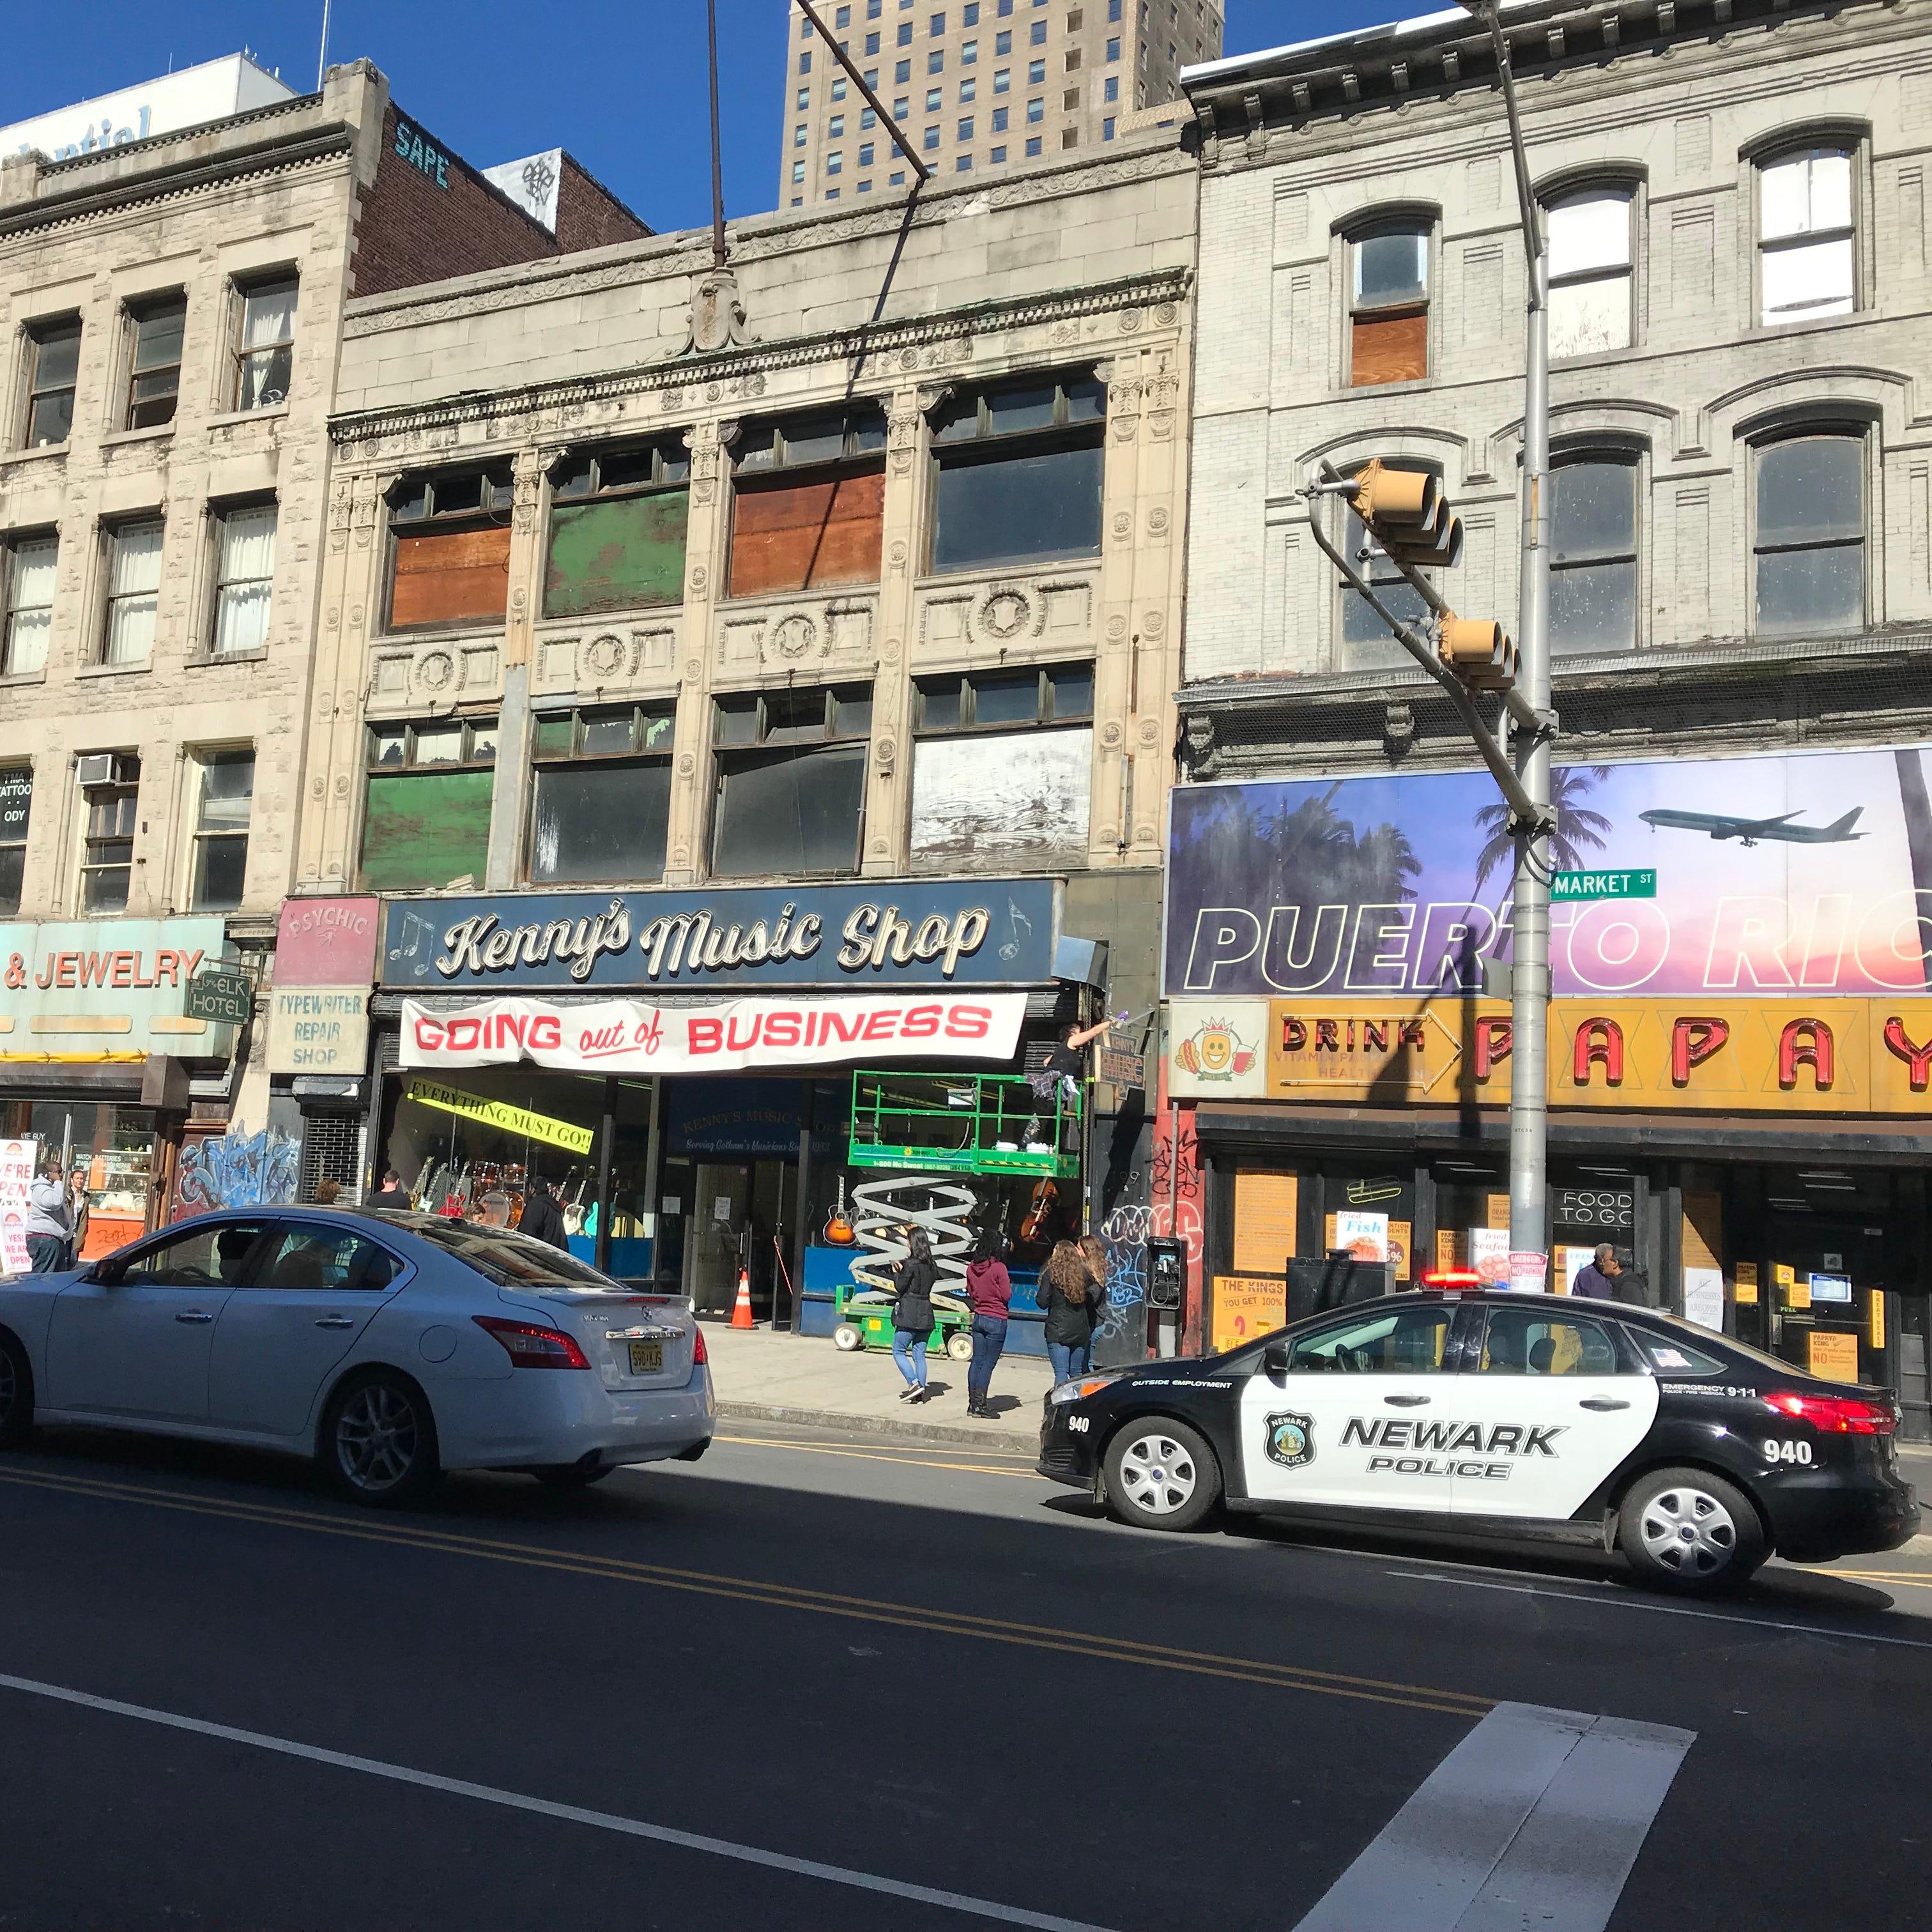 See behind-the-scenes: 'Joker' movie starring Joaquin Phoenix takes over Newark